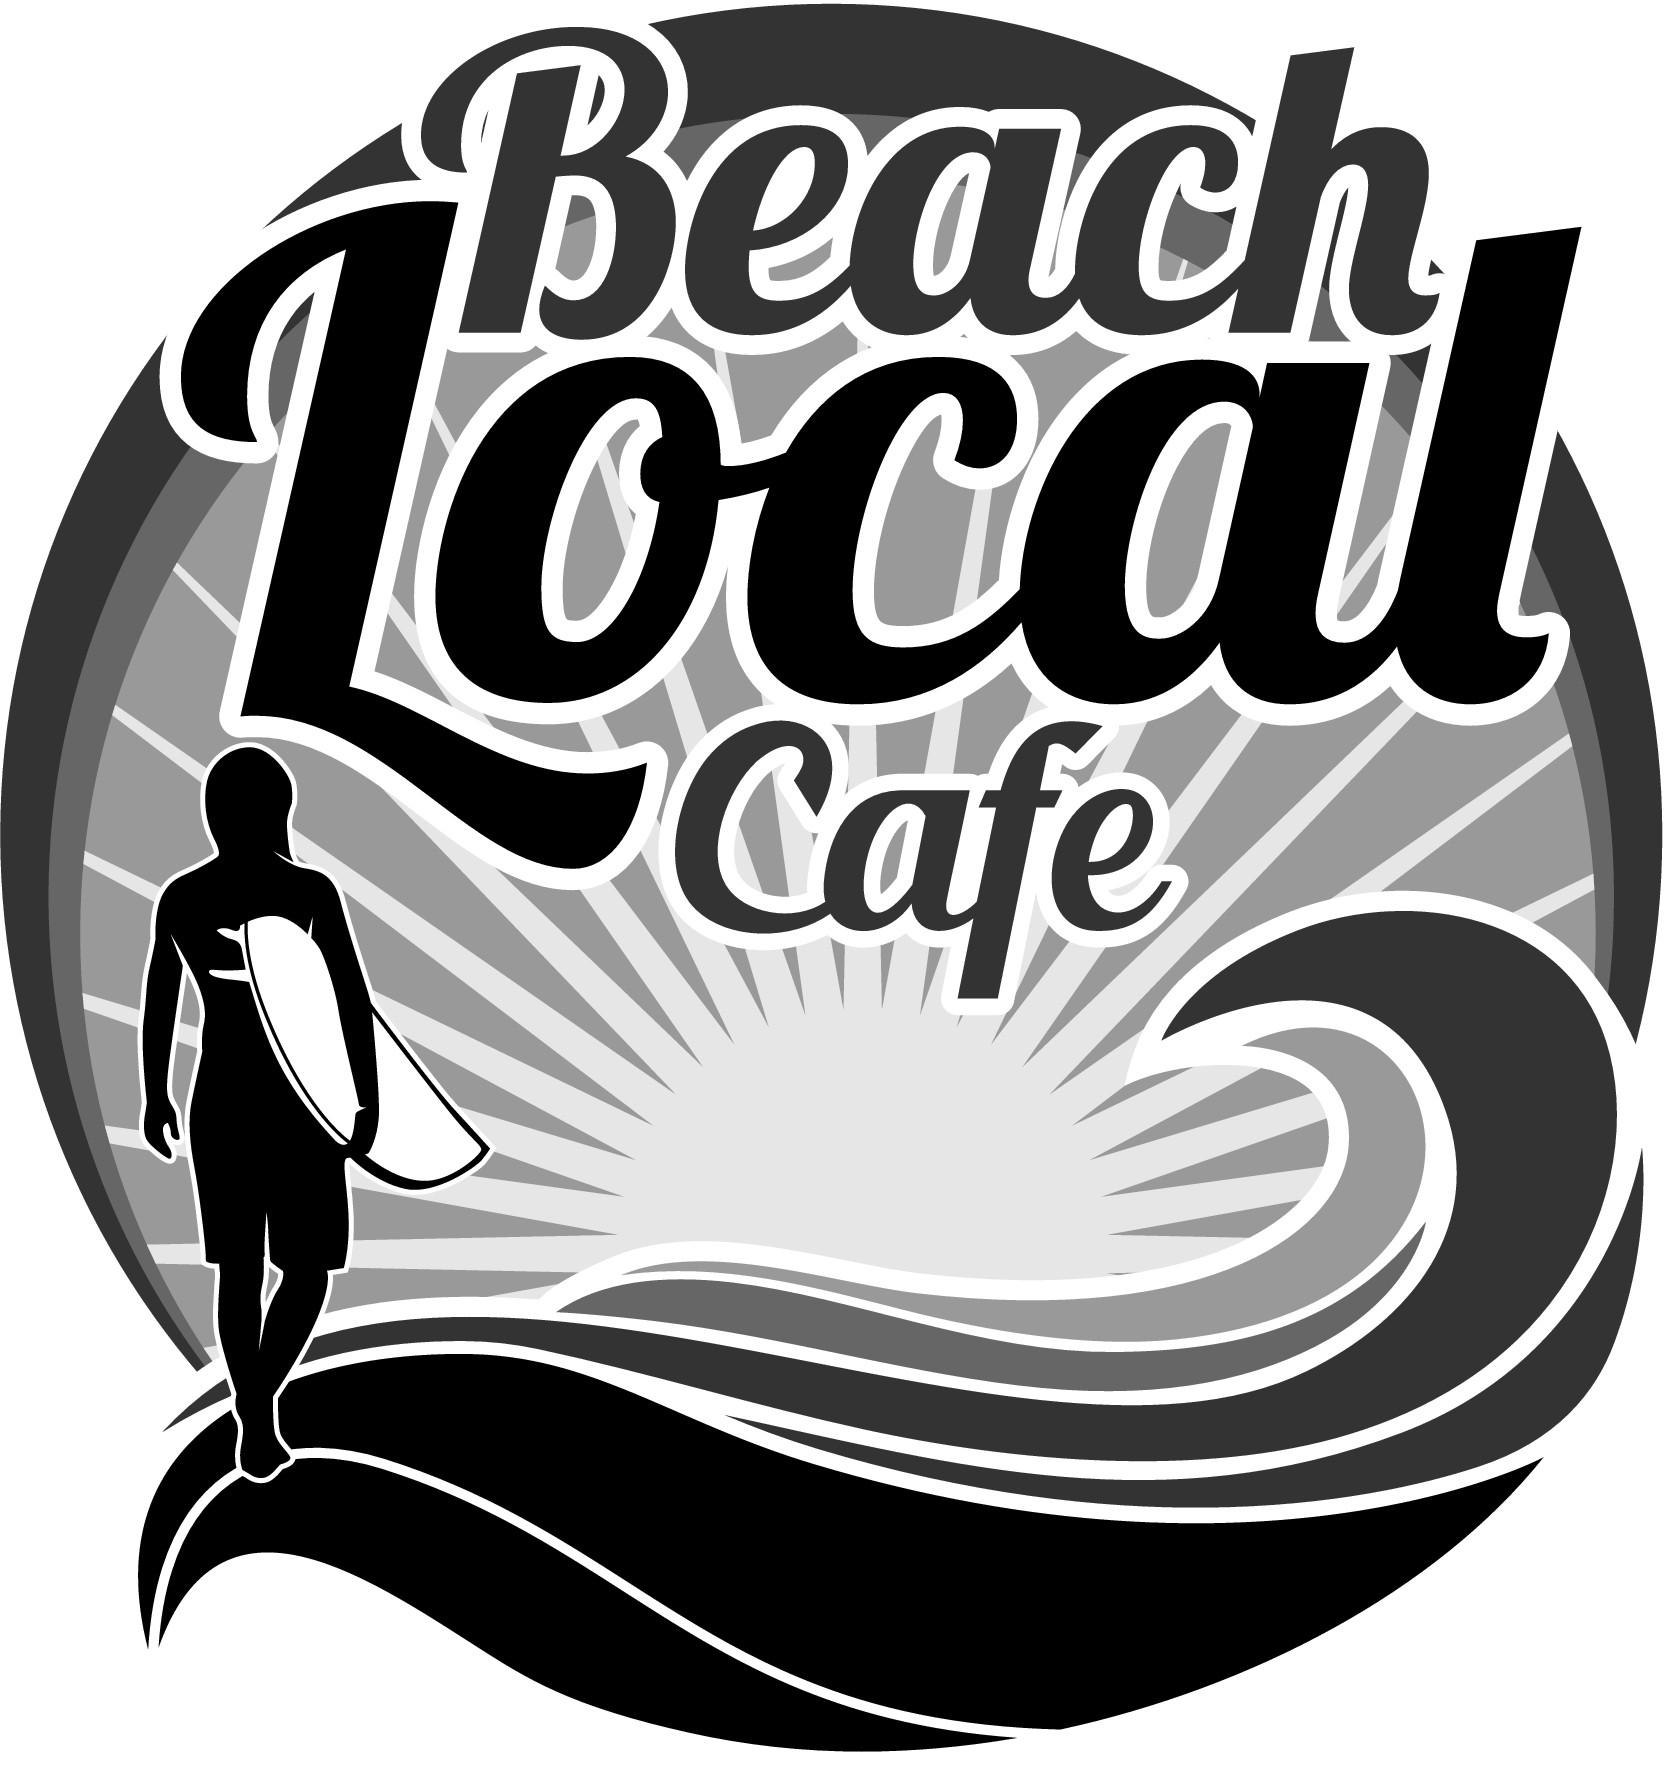 'Beach Local Cafe' coming soon to the Long Beach, NY boardwalk needs a logo!